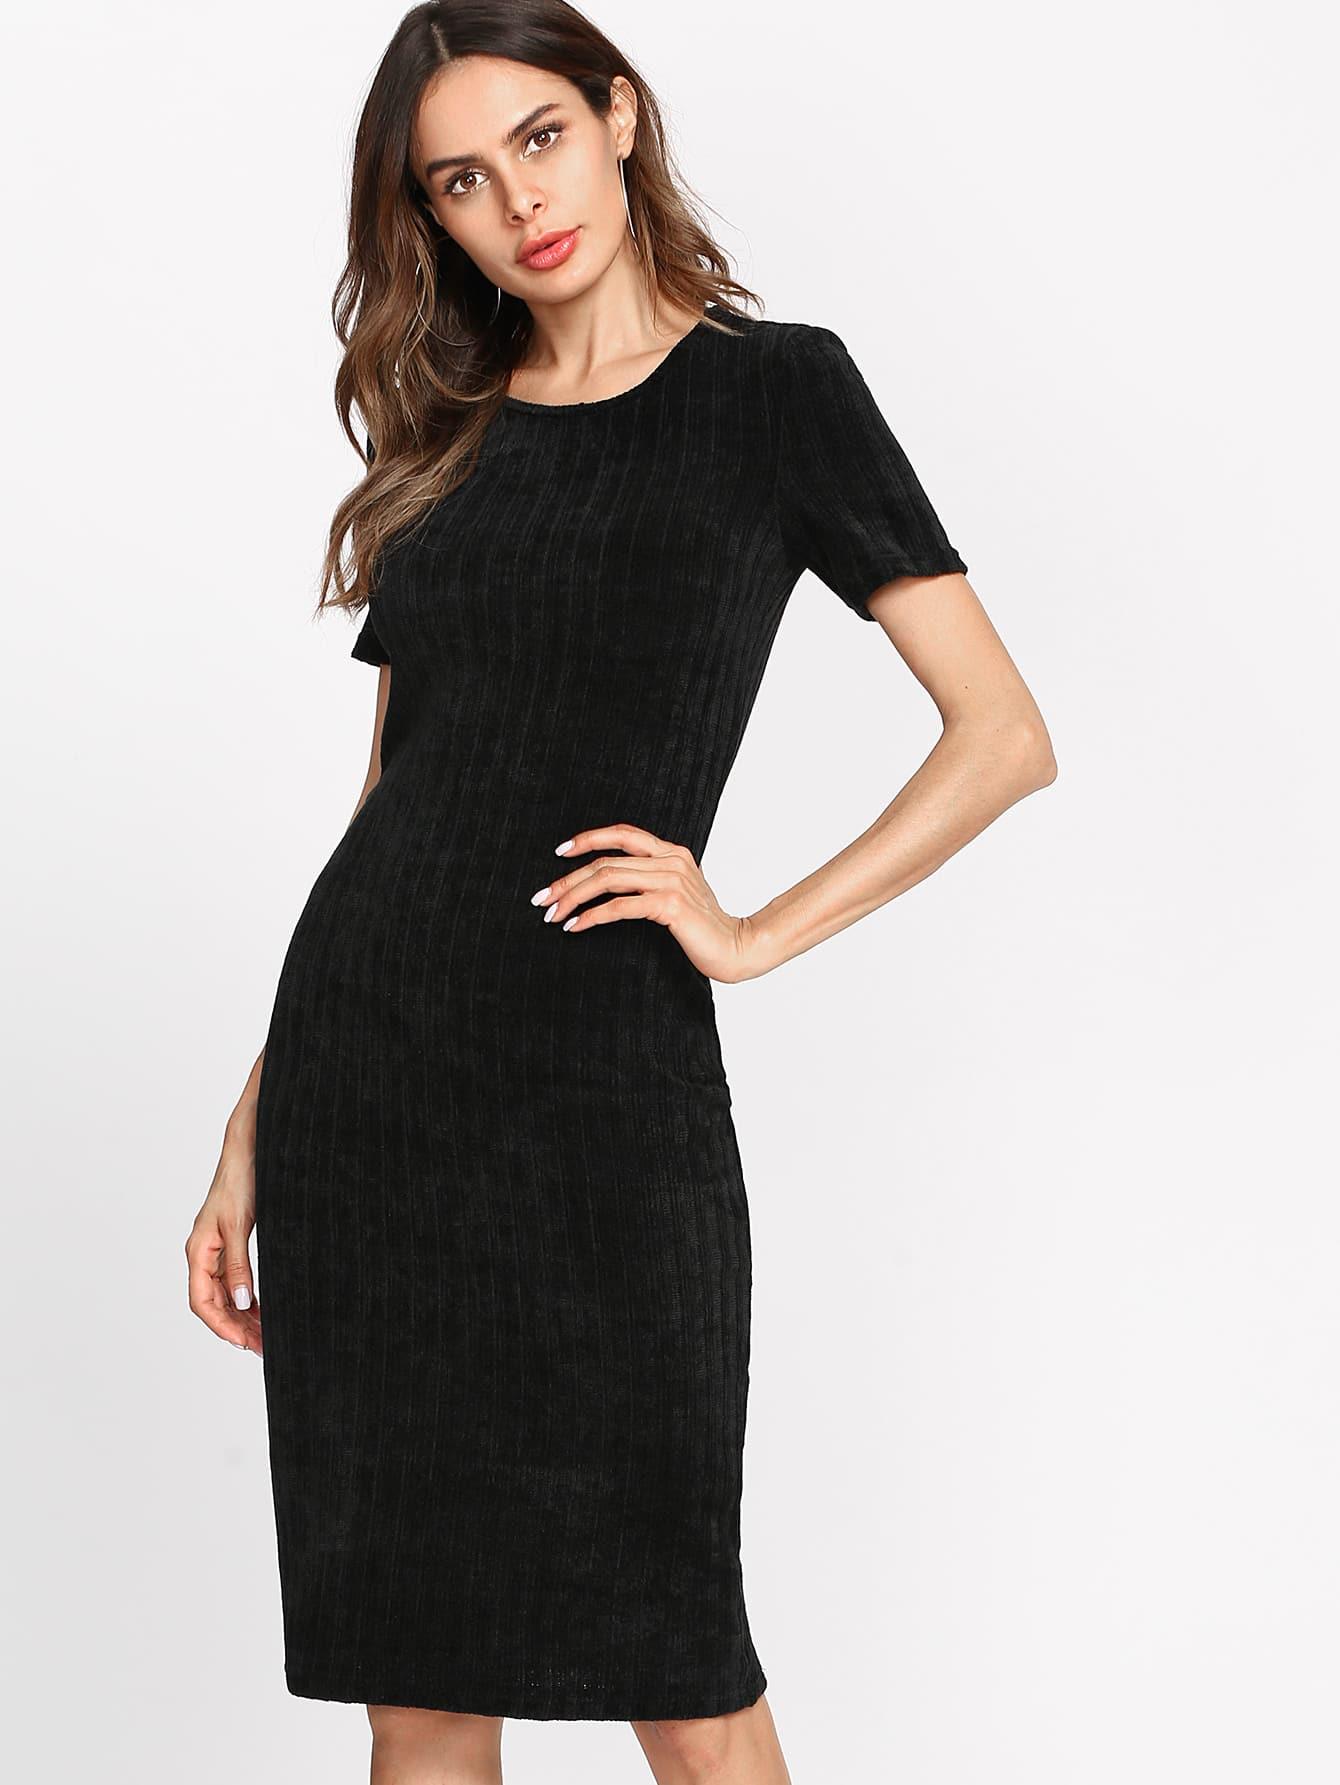 Form Fitting Ribbed Knit Dress dress171107704